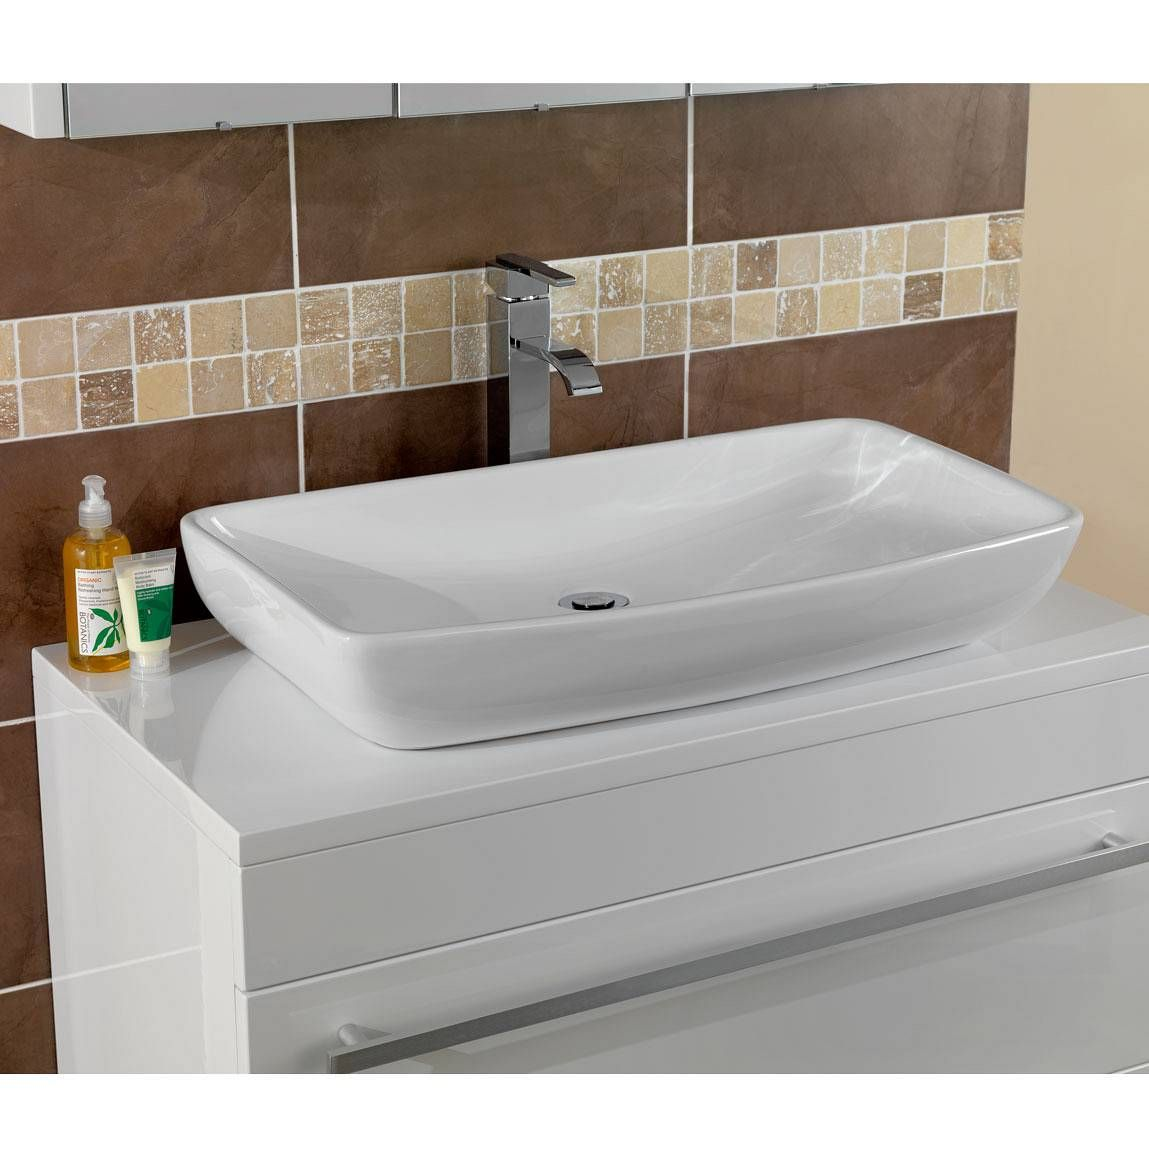 Verona Counter Top Basin. Verona Counter Top Basin   Bathrooms   Pinterest   The o jays